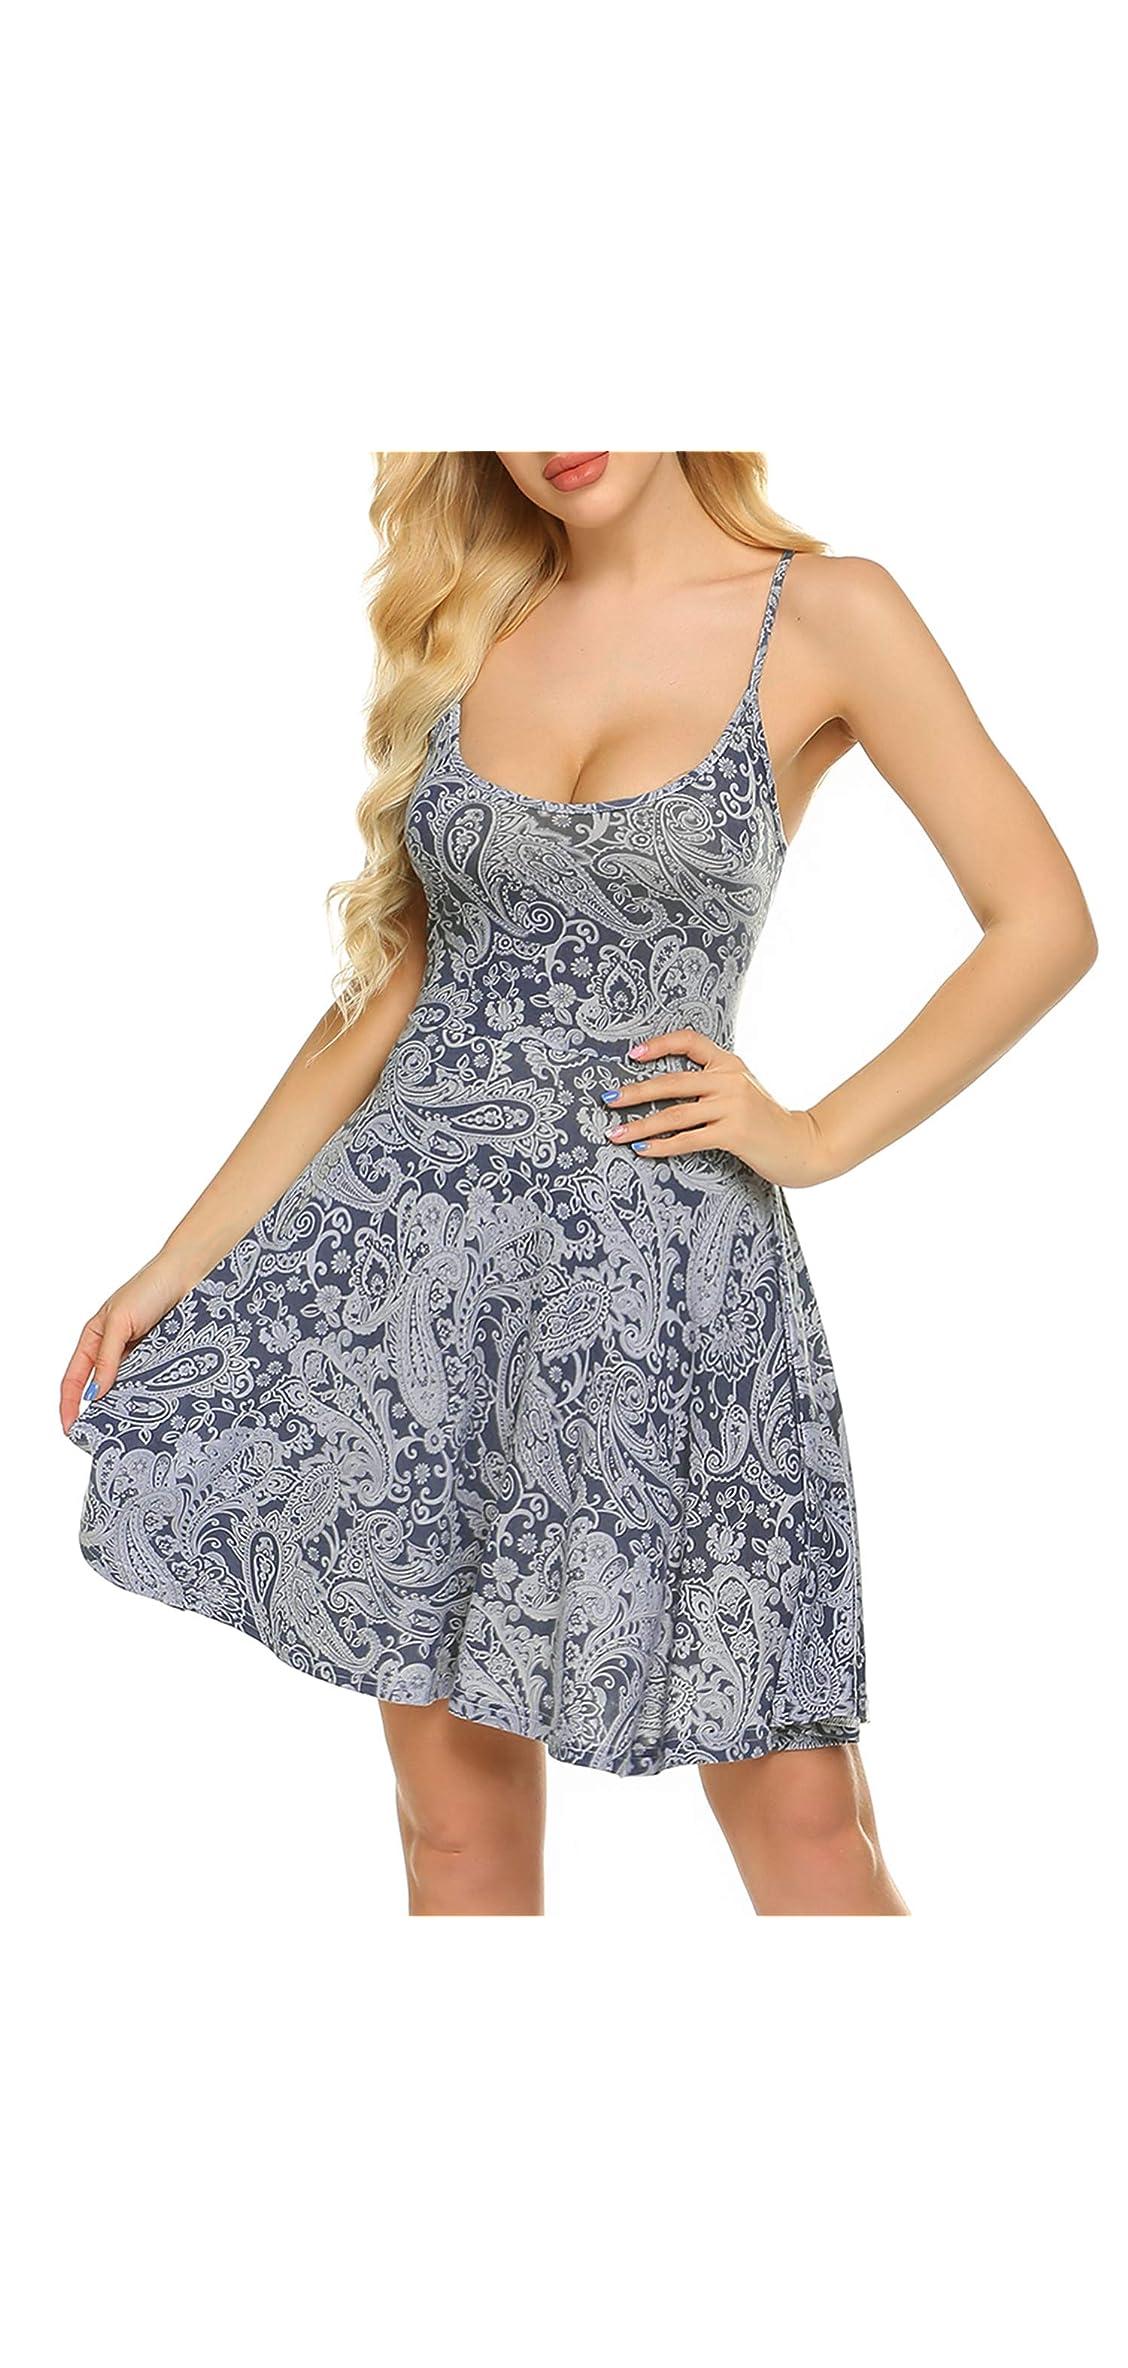 Women's Sleeveless Adjustable Strappy Summer Beach Floral